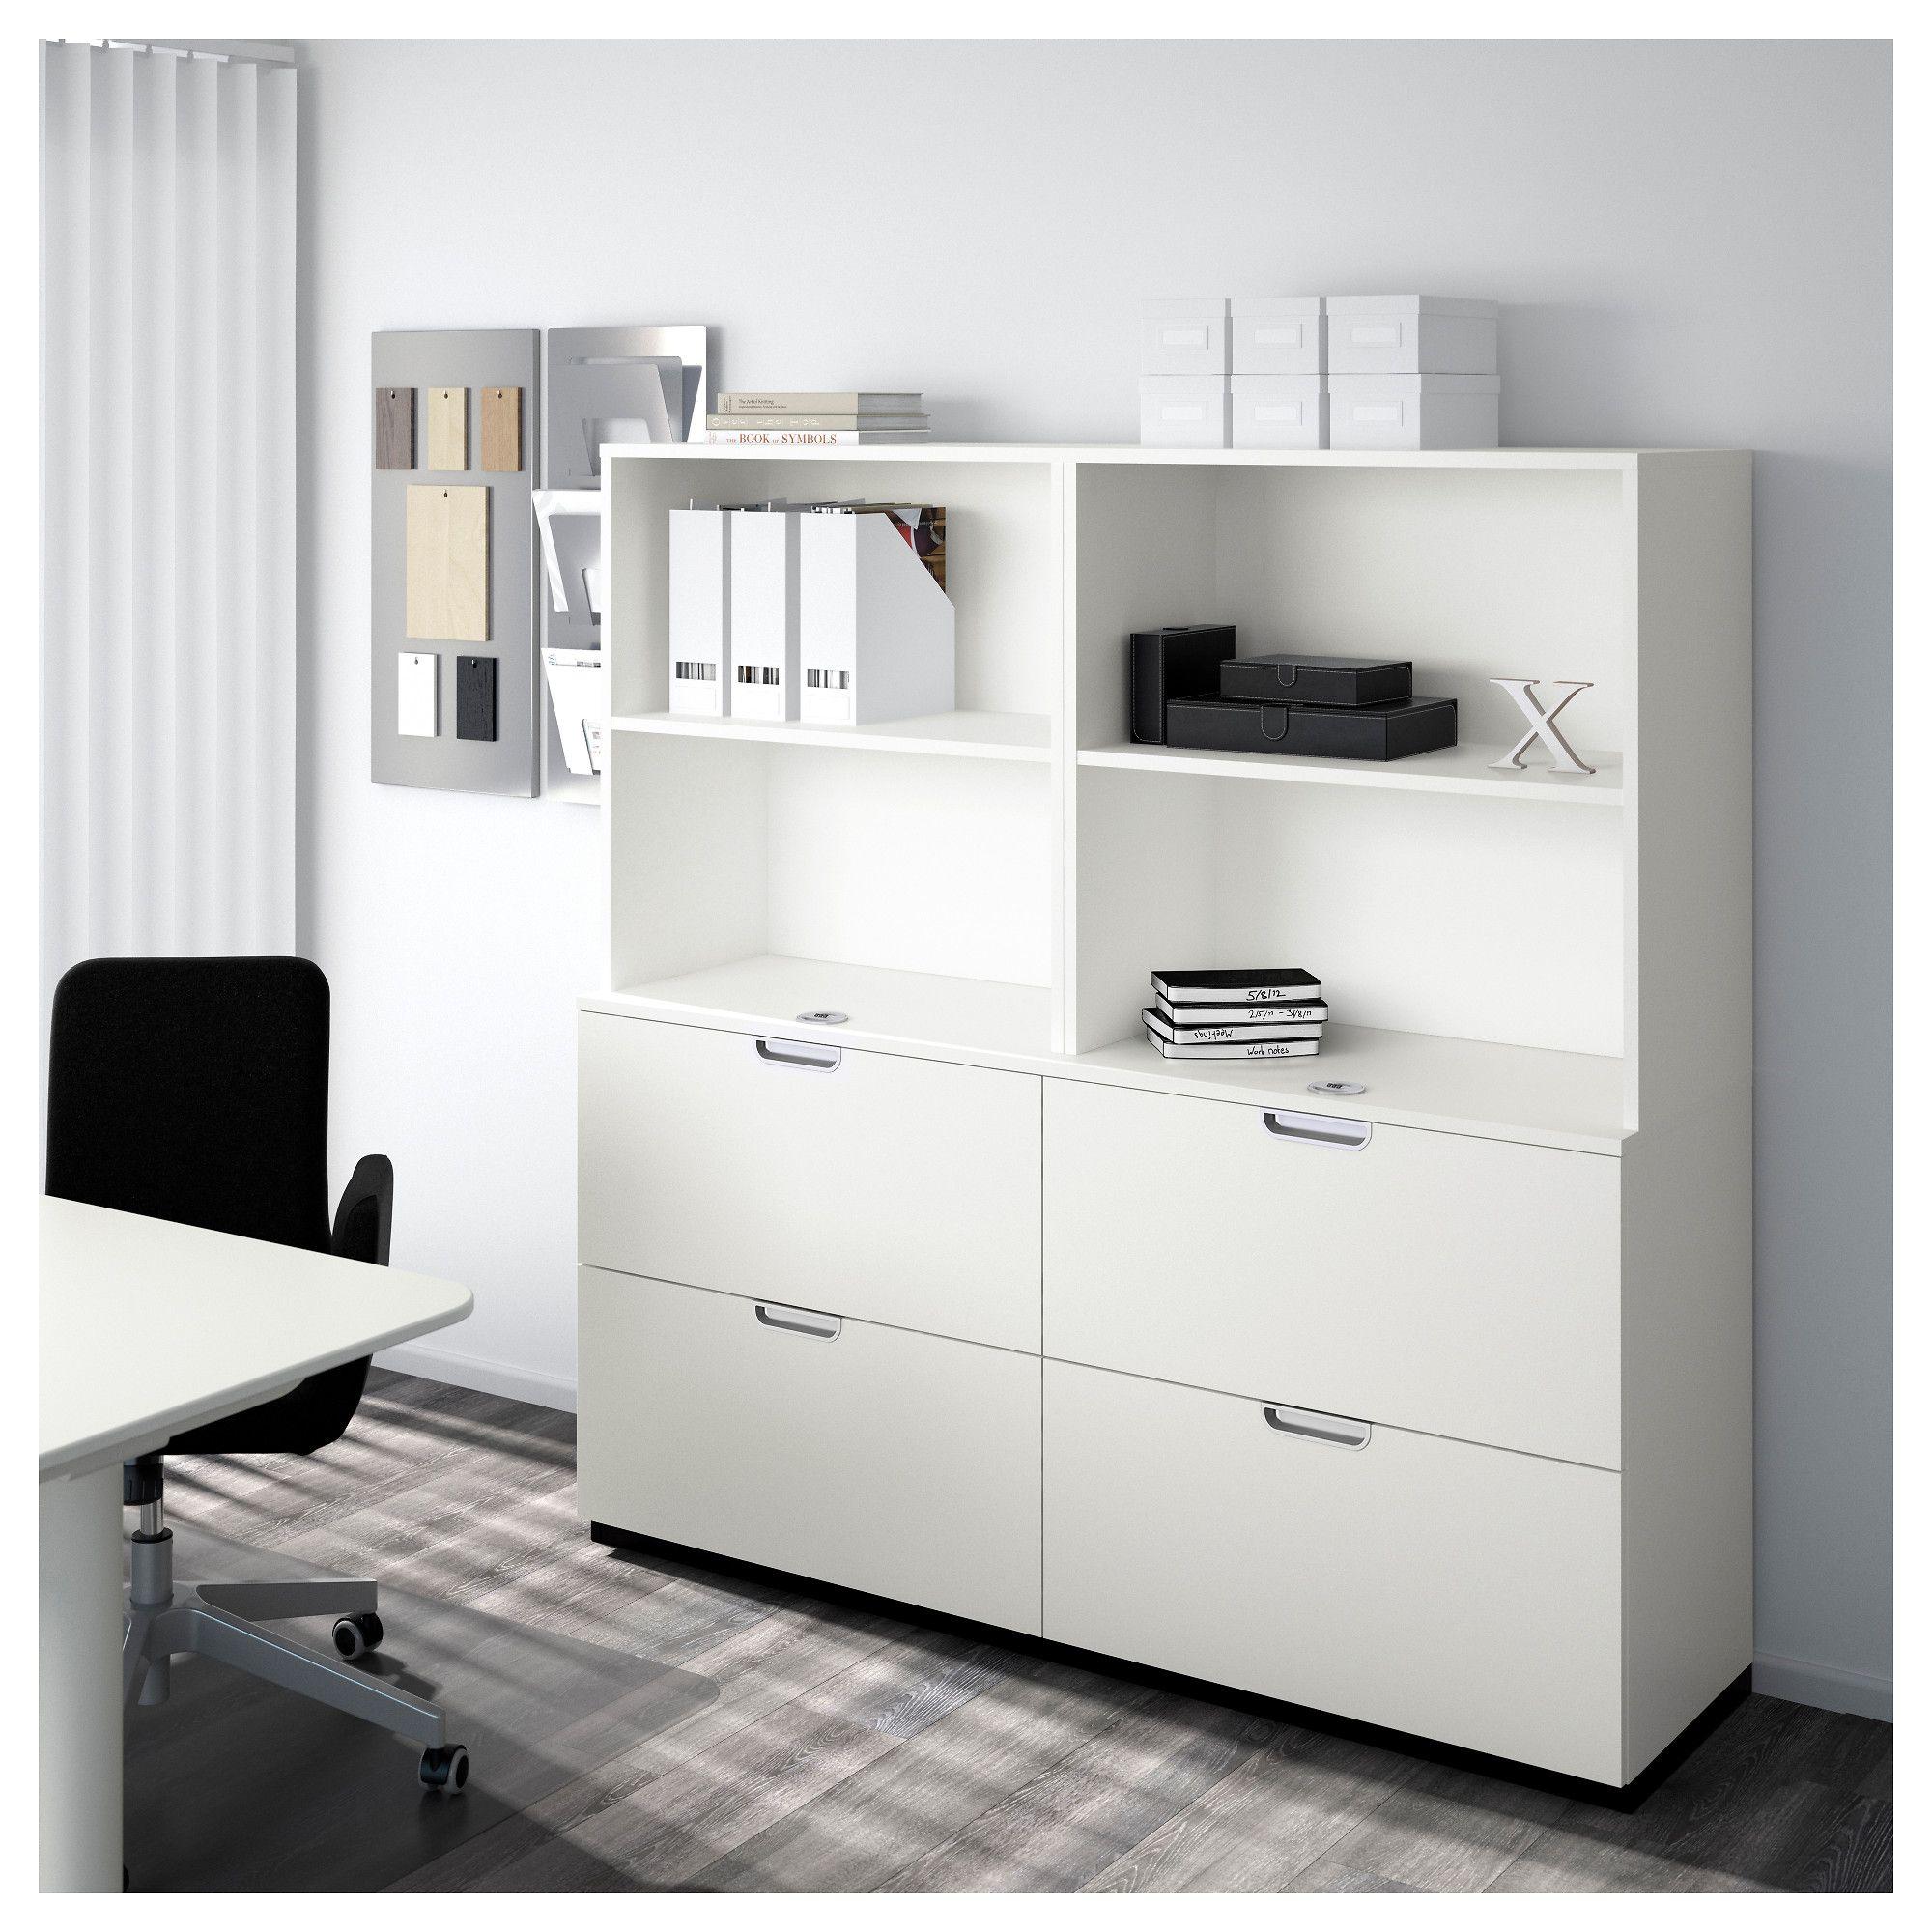 Galant Ikea ikea galant storage combination with filing white uni room